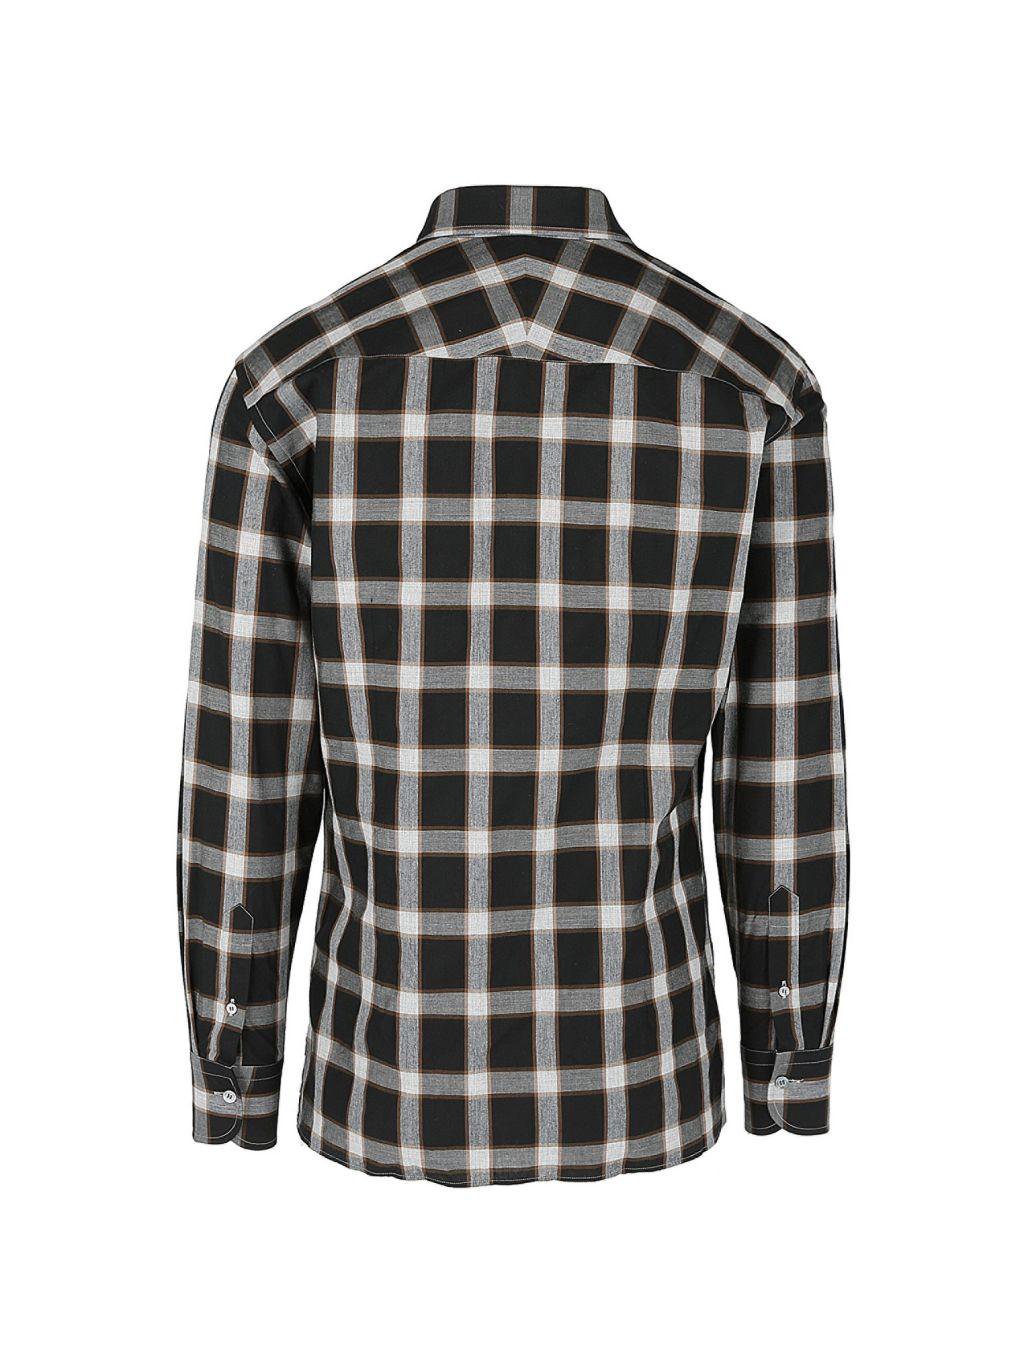 Dunhill Plaid Woven Button-Up Shirt